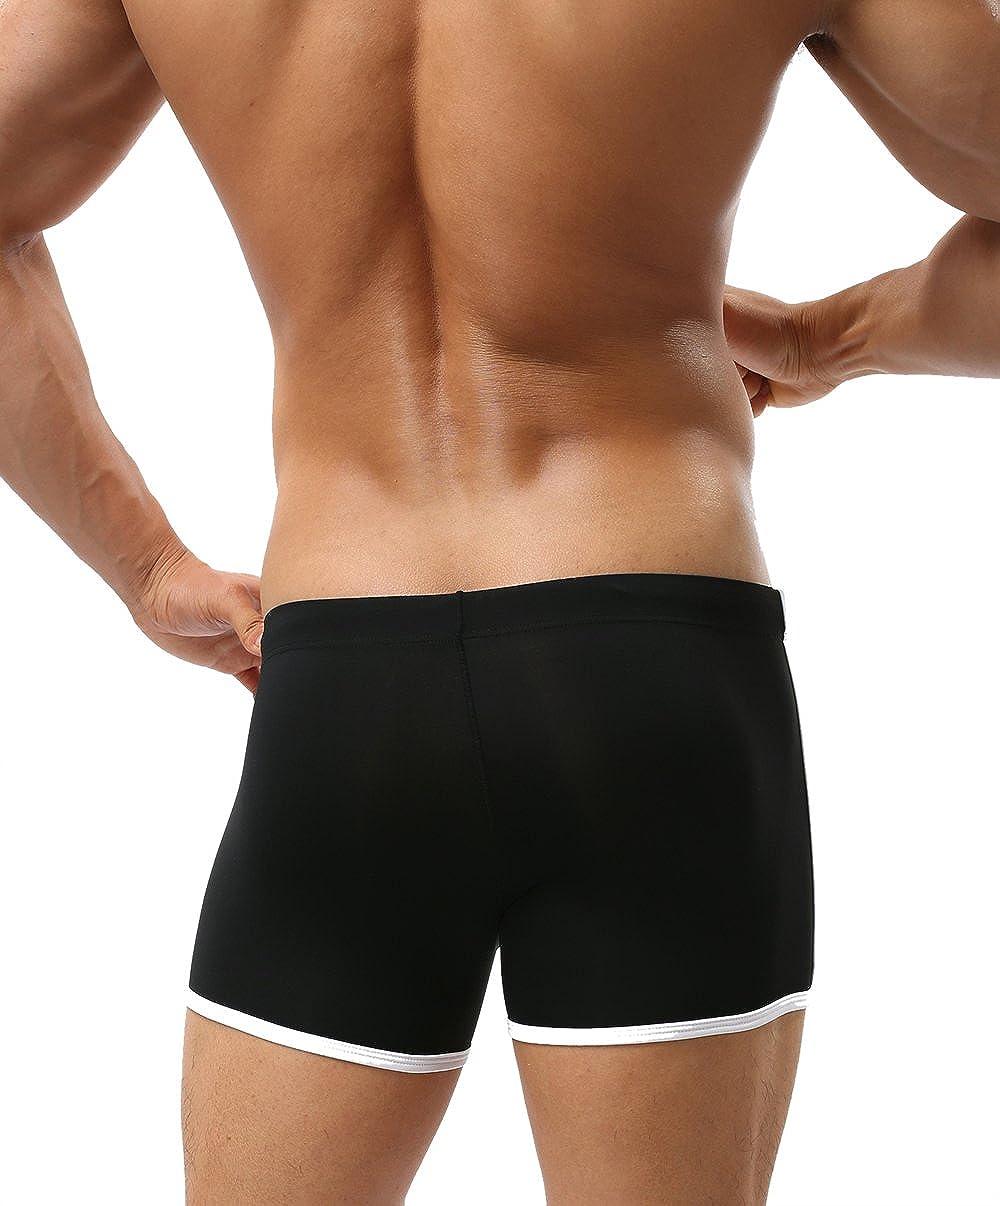 BRAVE PERSON Mens Swim Boxer Briefs Summer Beach Swimsuit Board Shorts 1010